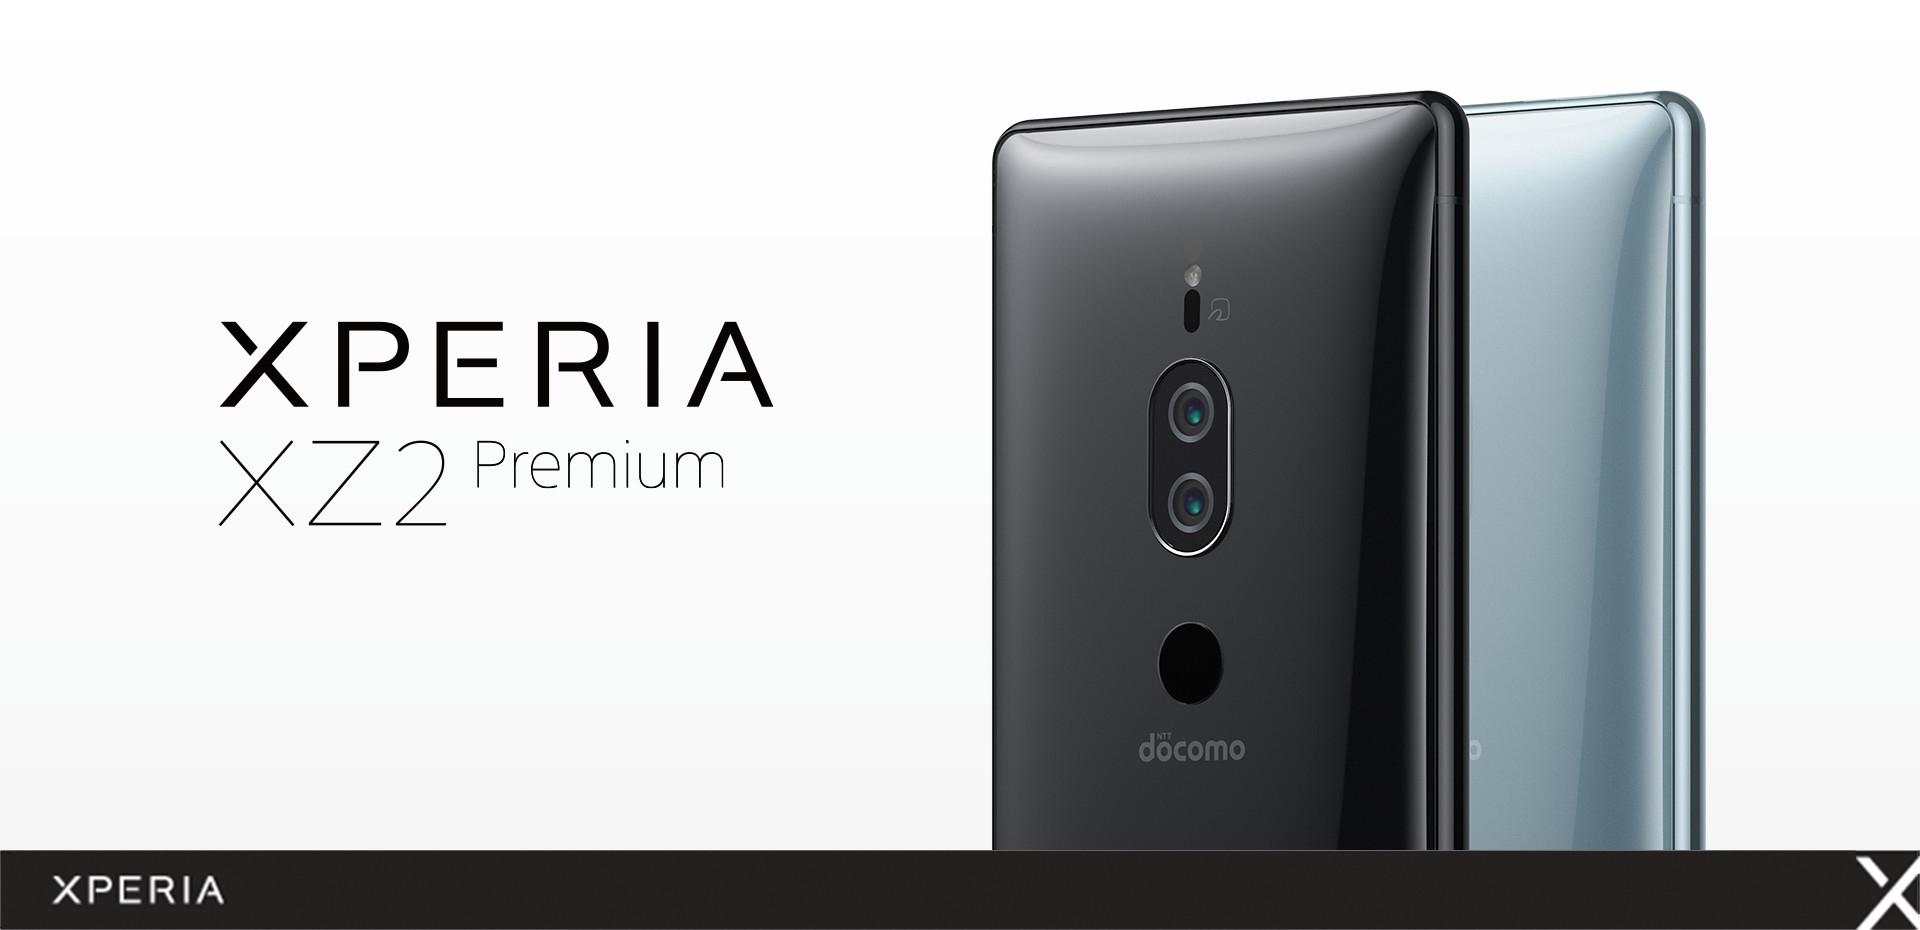 xperia エクスペリア xz2 premium プレミアム ドコモ so 04k